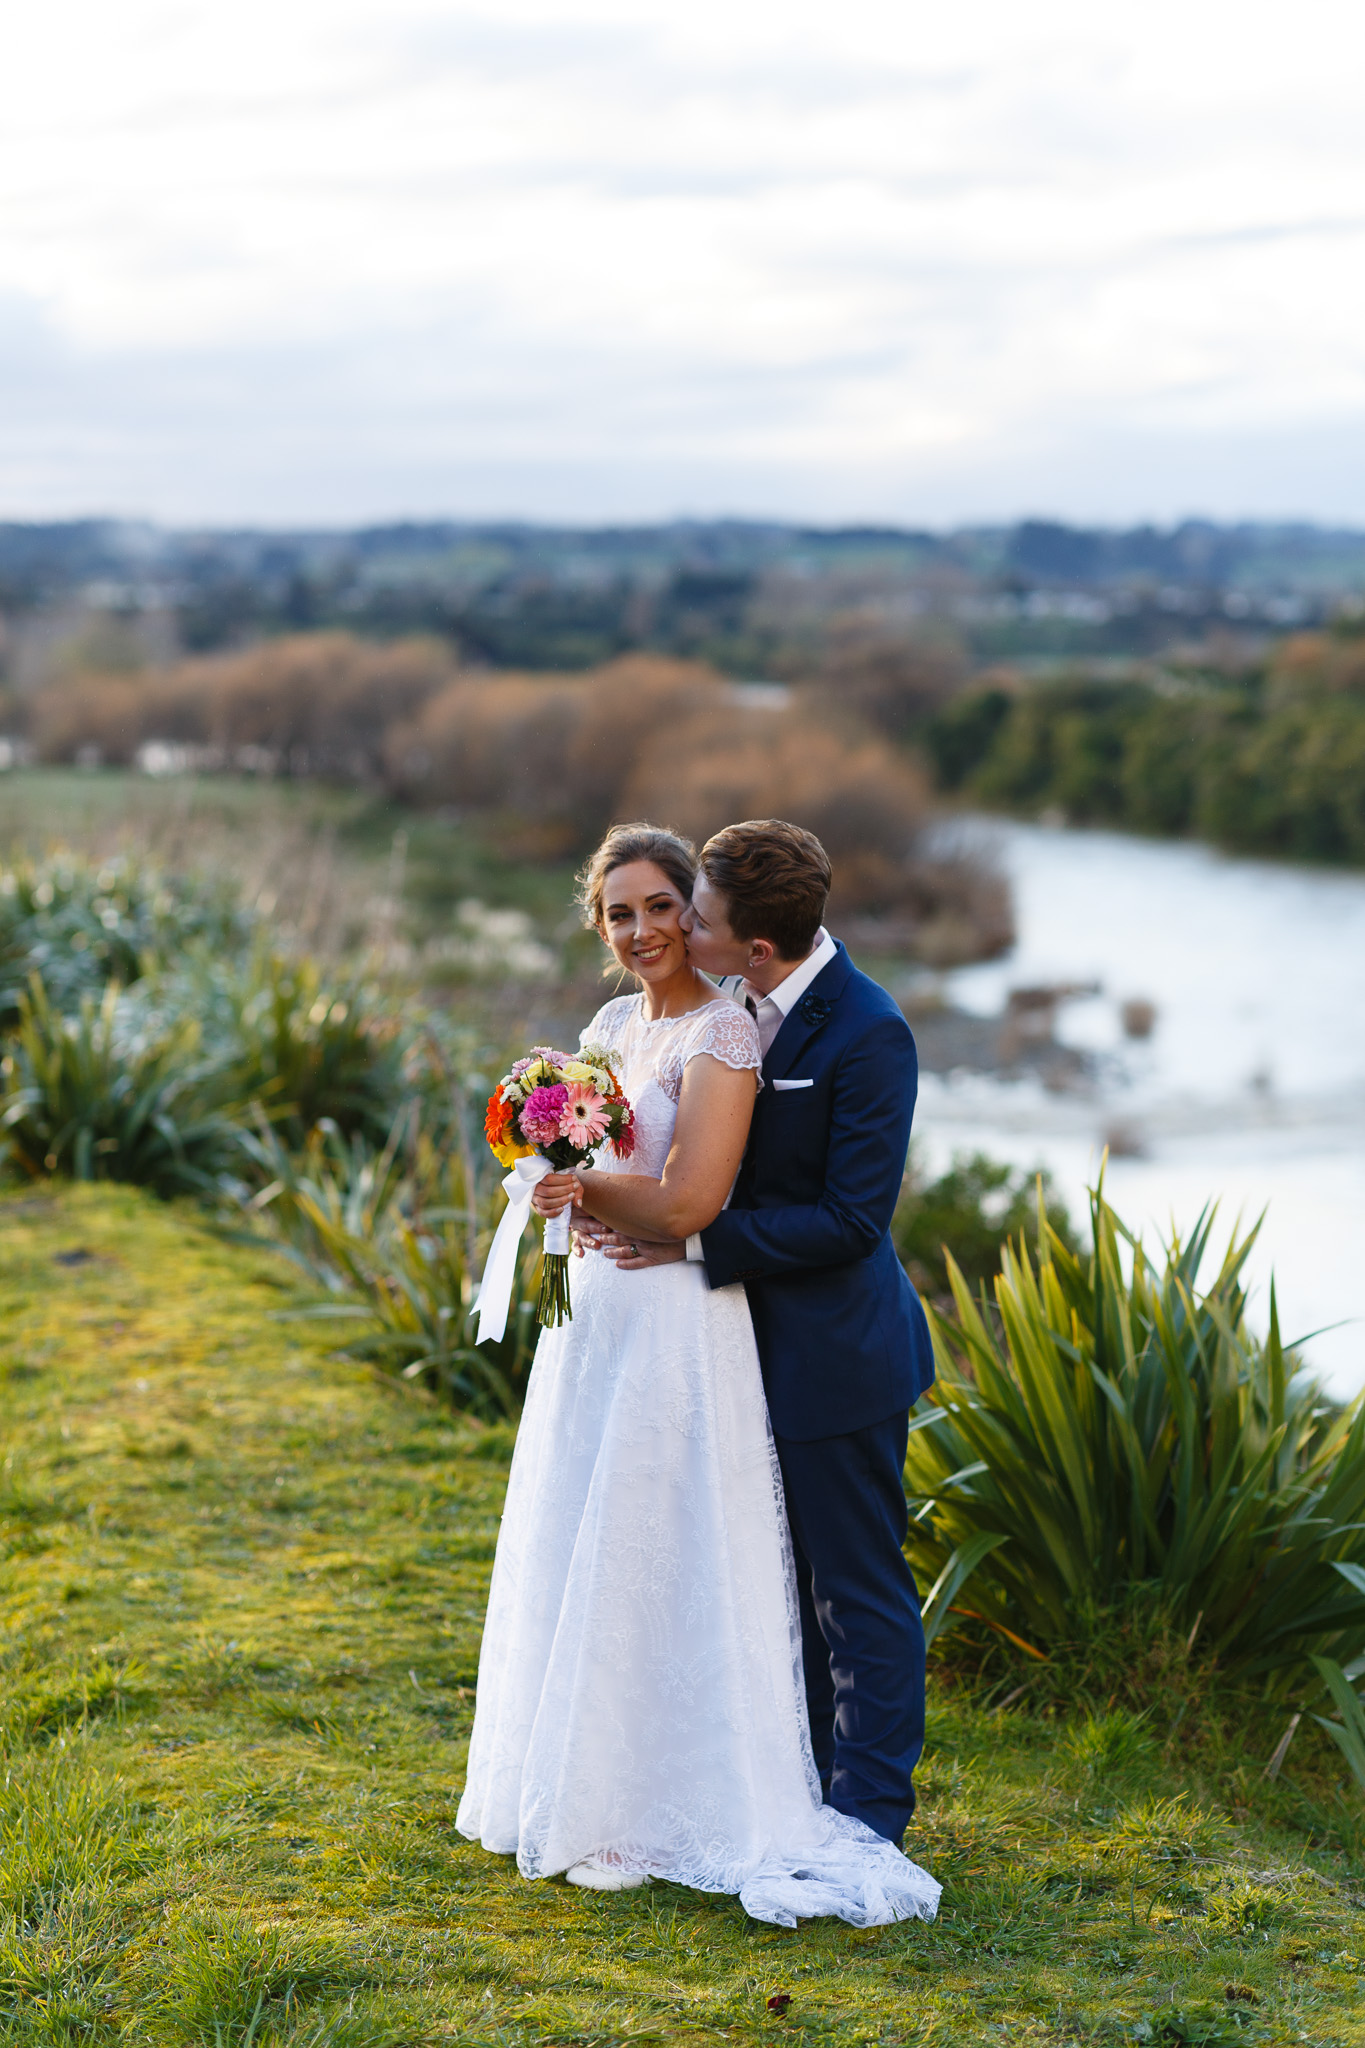 palmerston-north-wedding-photography-highlight-new-zealand.jpg-510.jpg